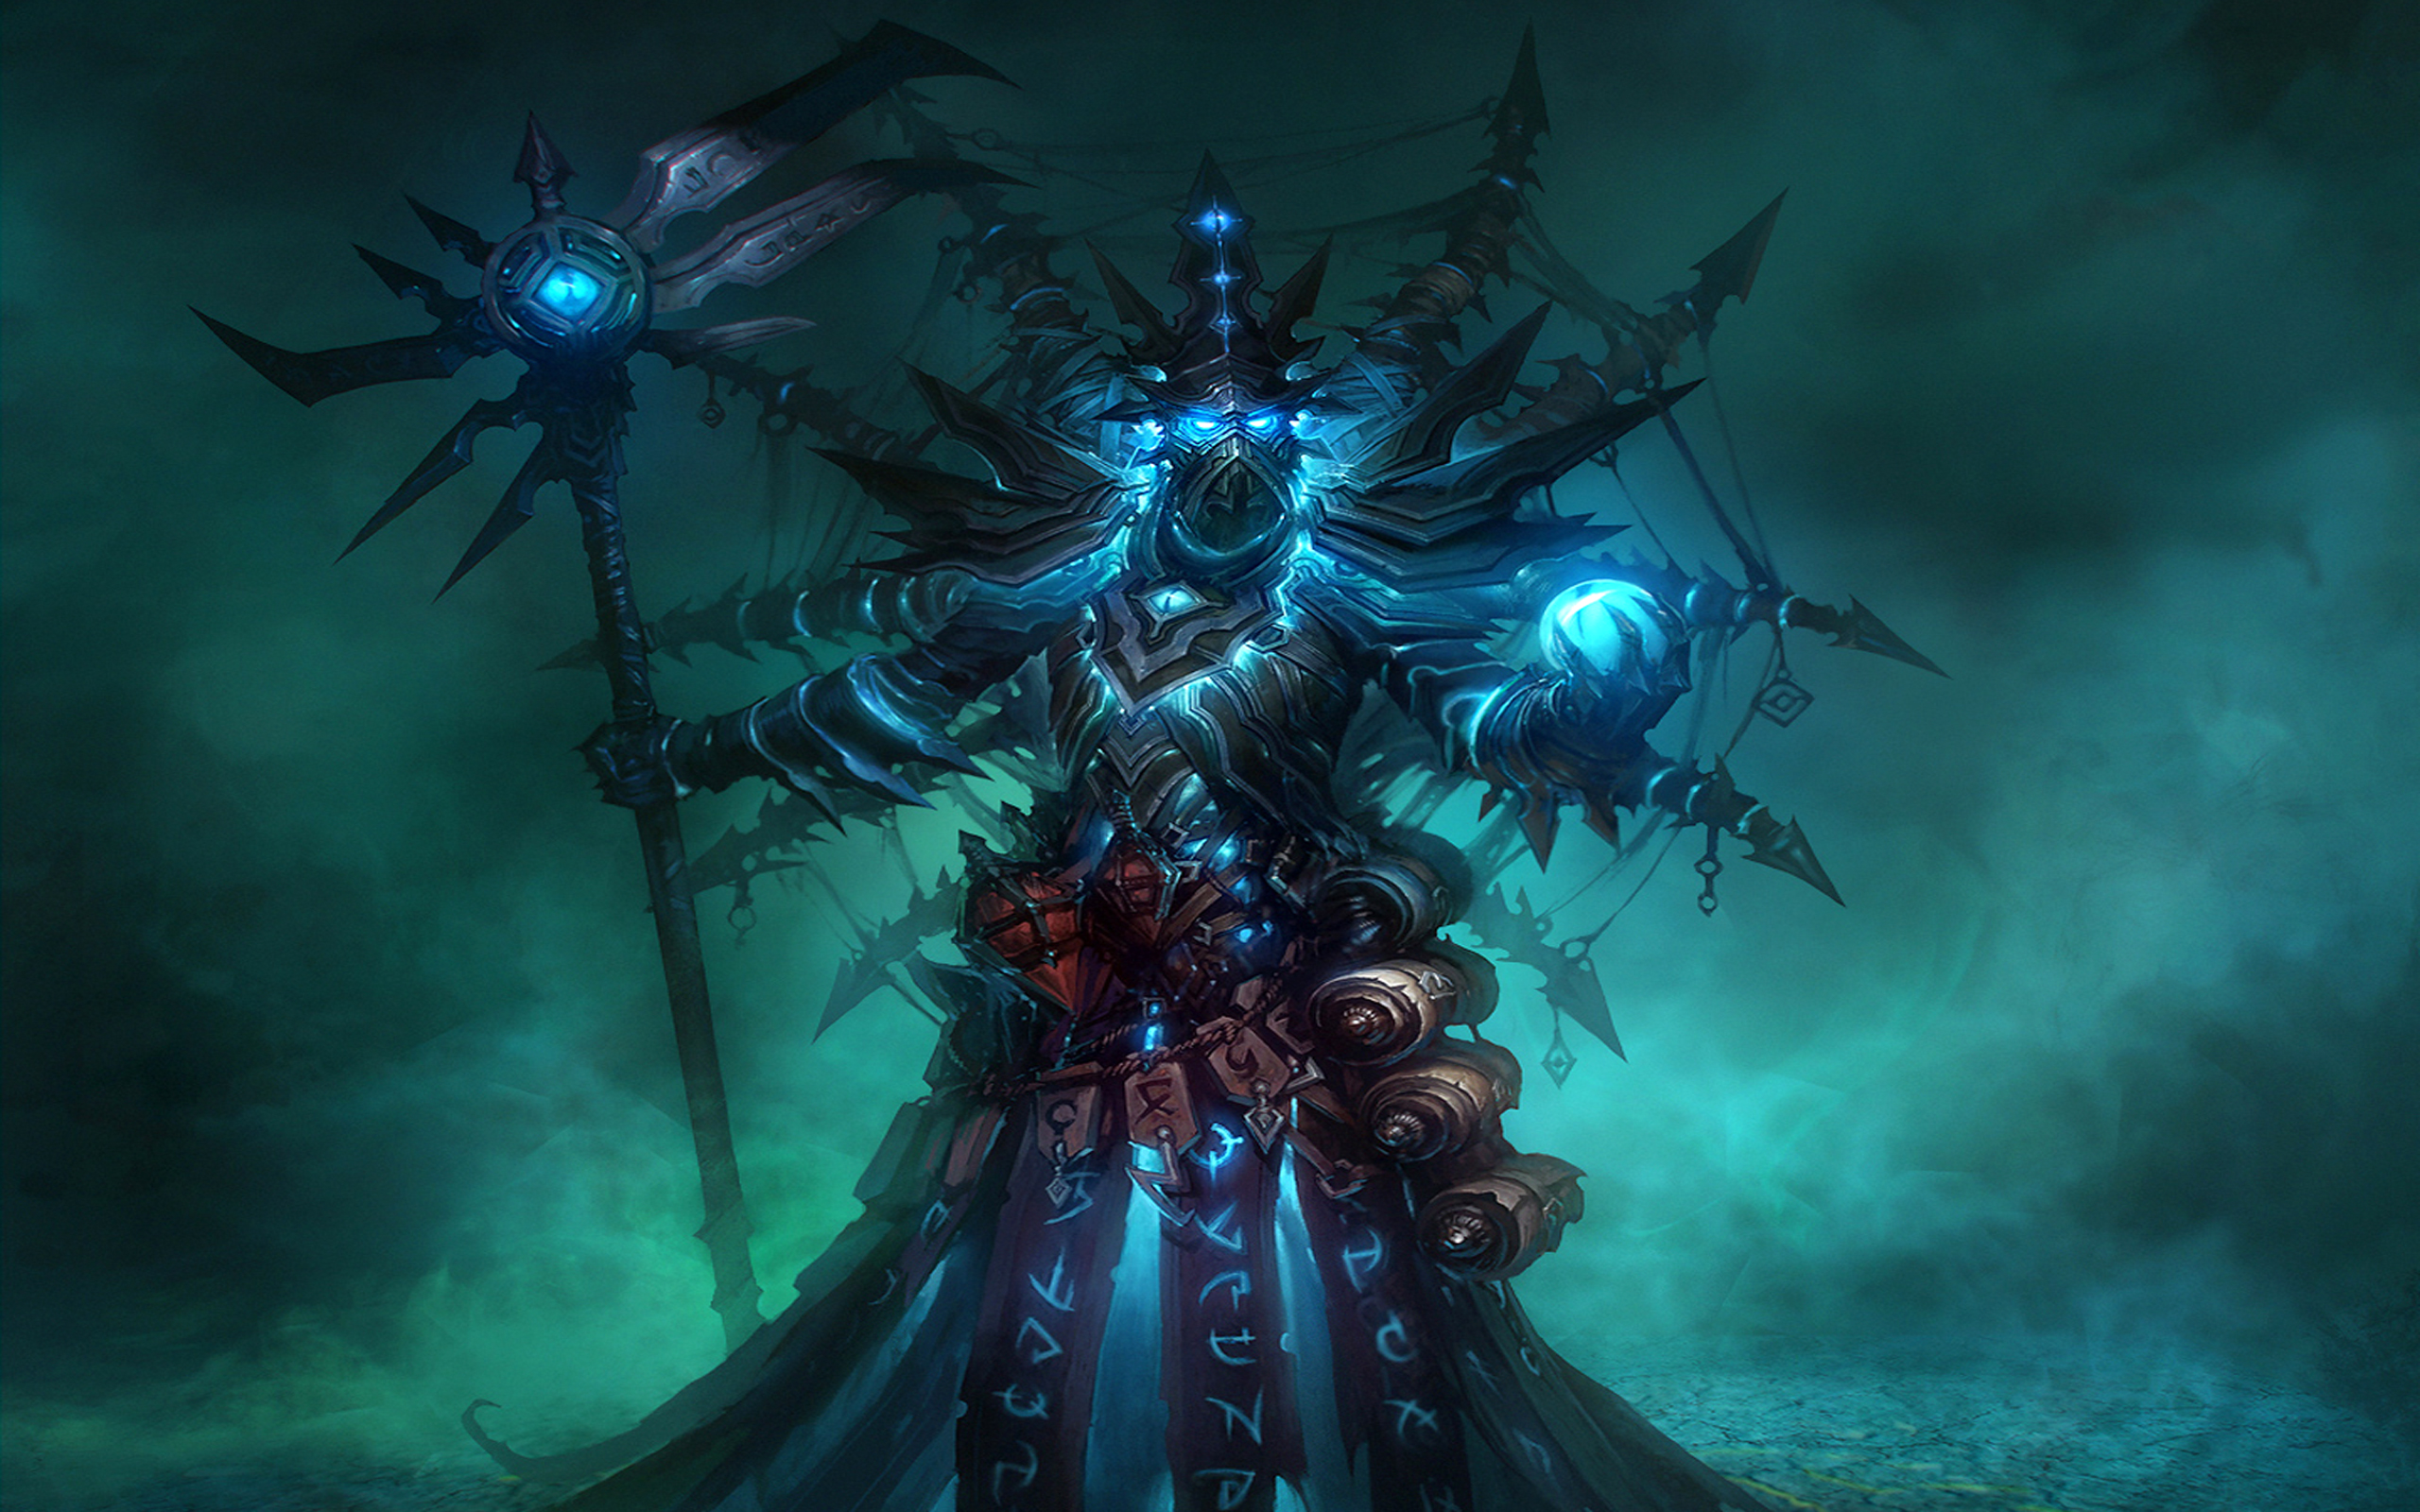 Jeux Vidéo - Warhammer  - Glass Armor - Ringwraith Fond d'écran